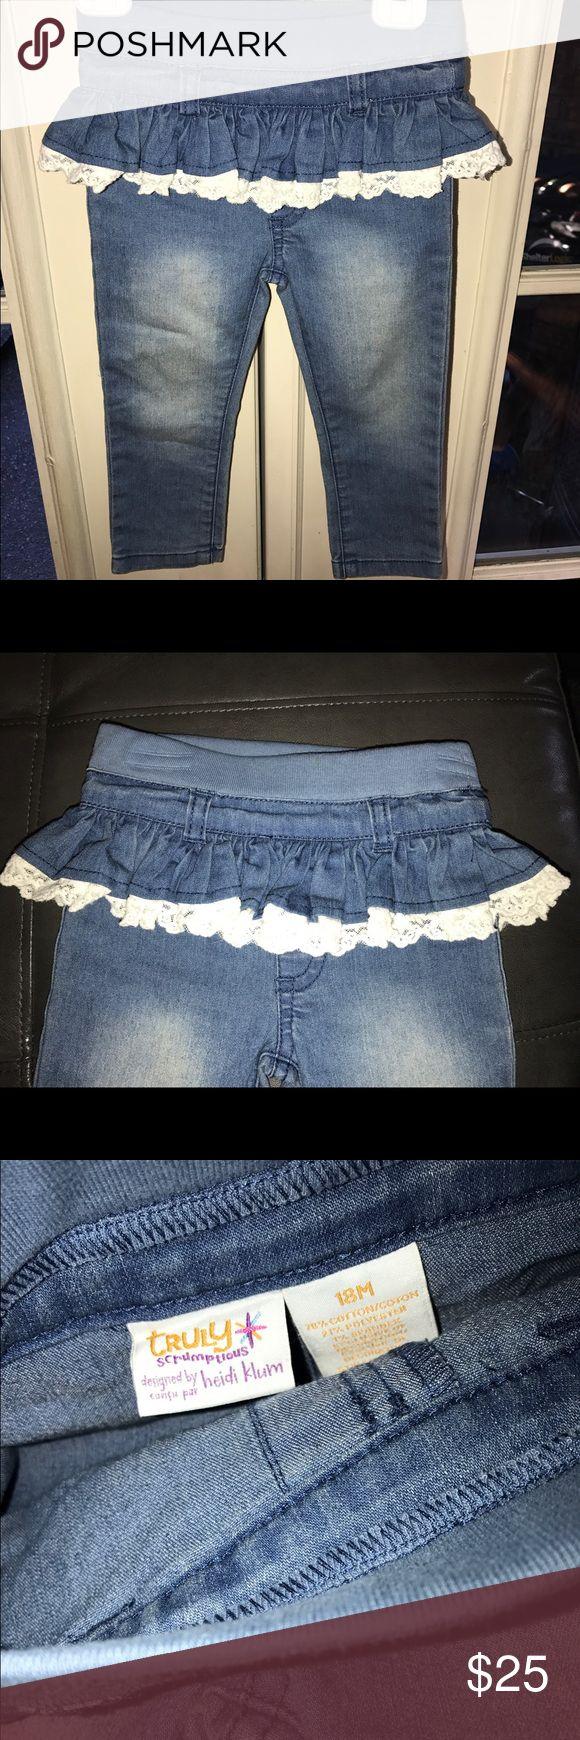 Heidi Klum baby kids jeans Size 18 M Truly Scrumptious by Heidi Klum jeans Size 18 M. No tags but never been worn. Pet/smoke free home!! heidi klum  Bottoms Jeans